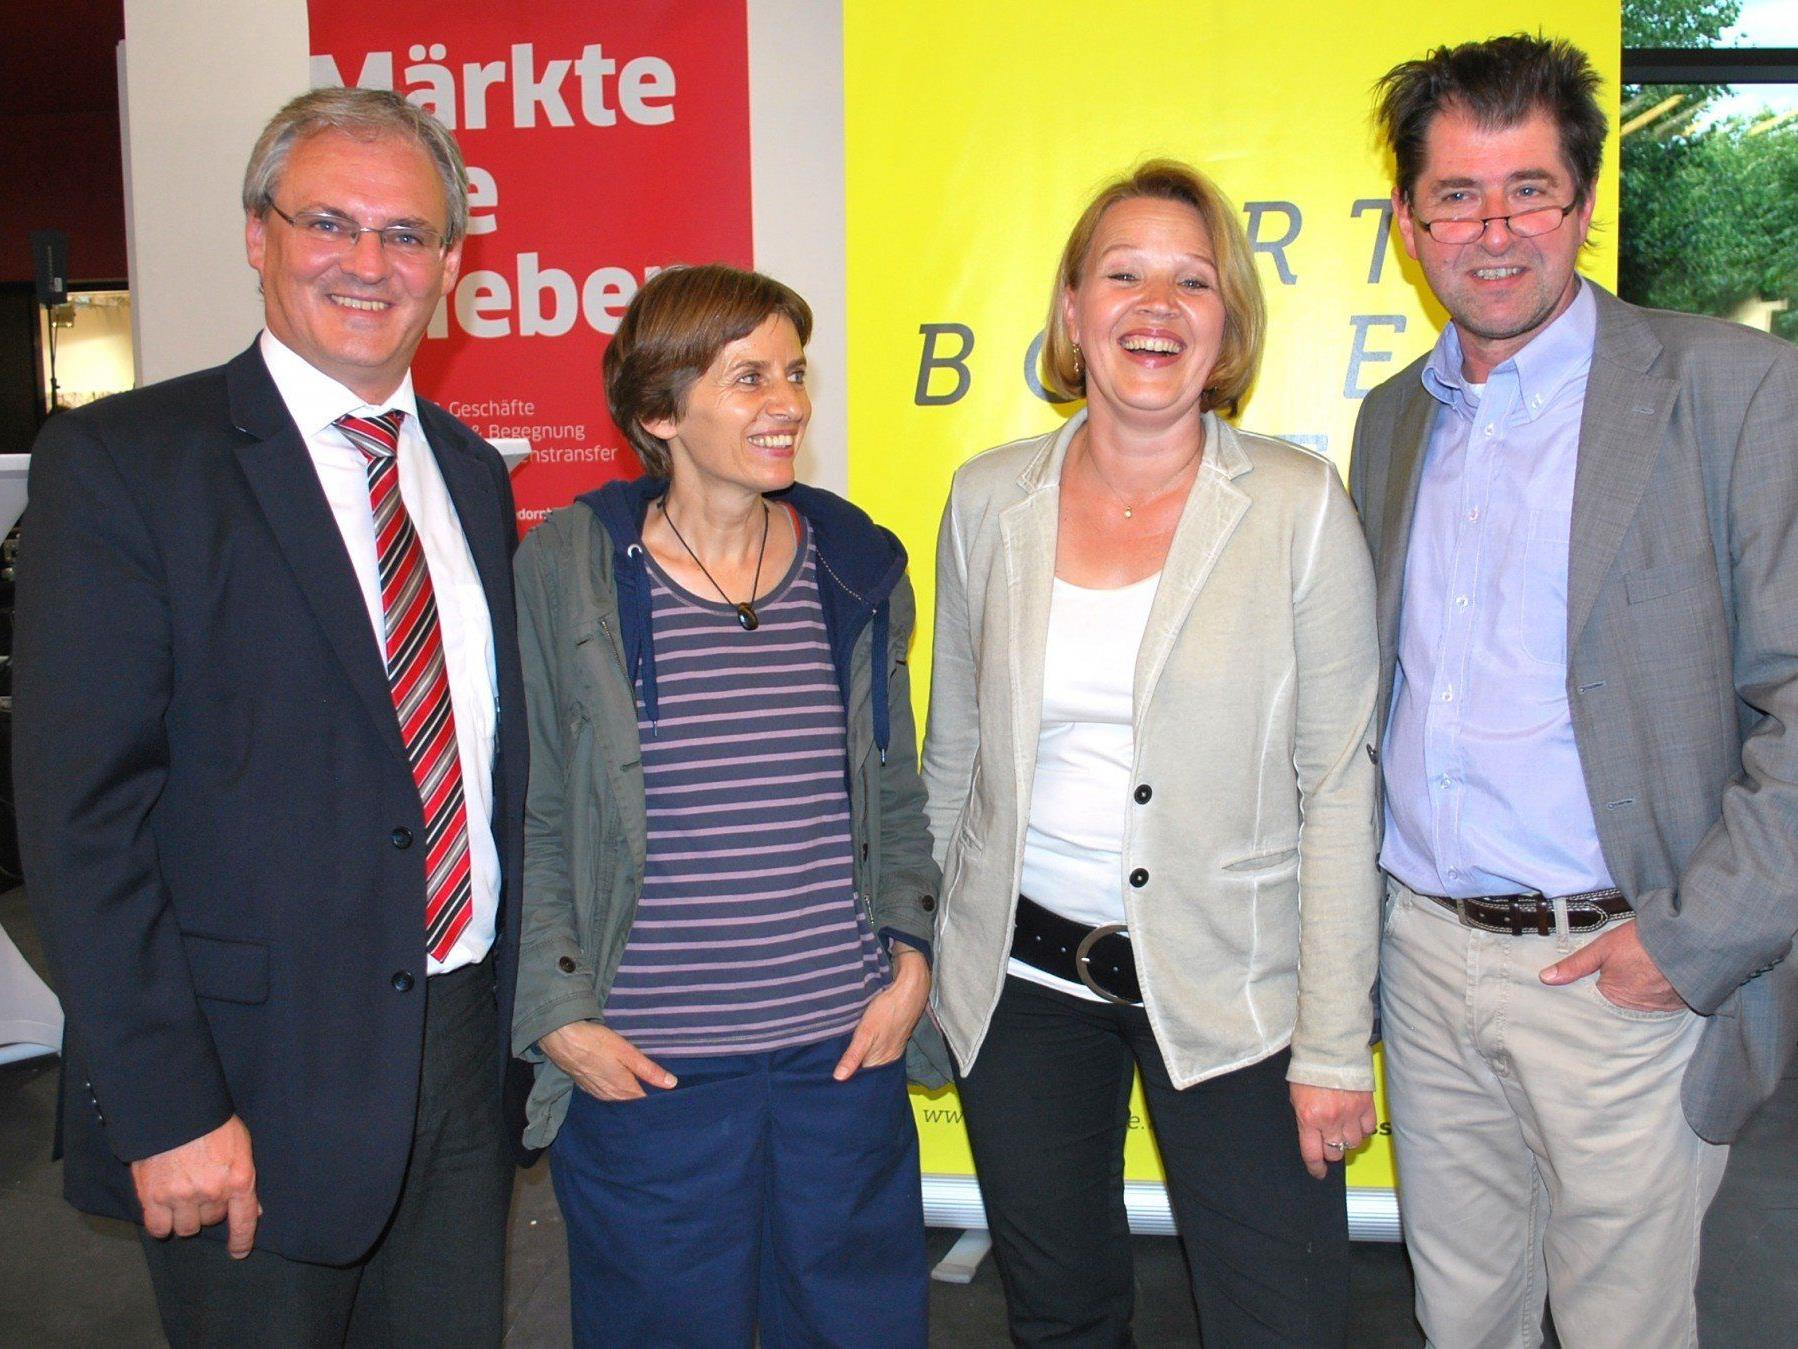 Eröffneten bestens gelaunt die Art Bodensee: Harald Sonderegger, Cäcilia Falk, Andrea Kaufmann, Harald Gfader (vl)